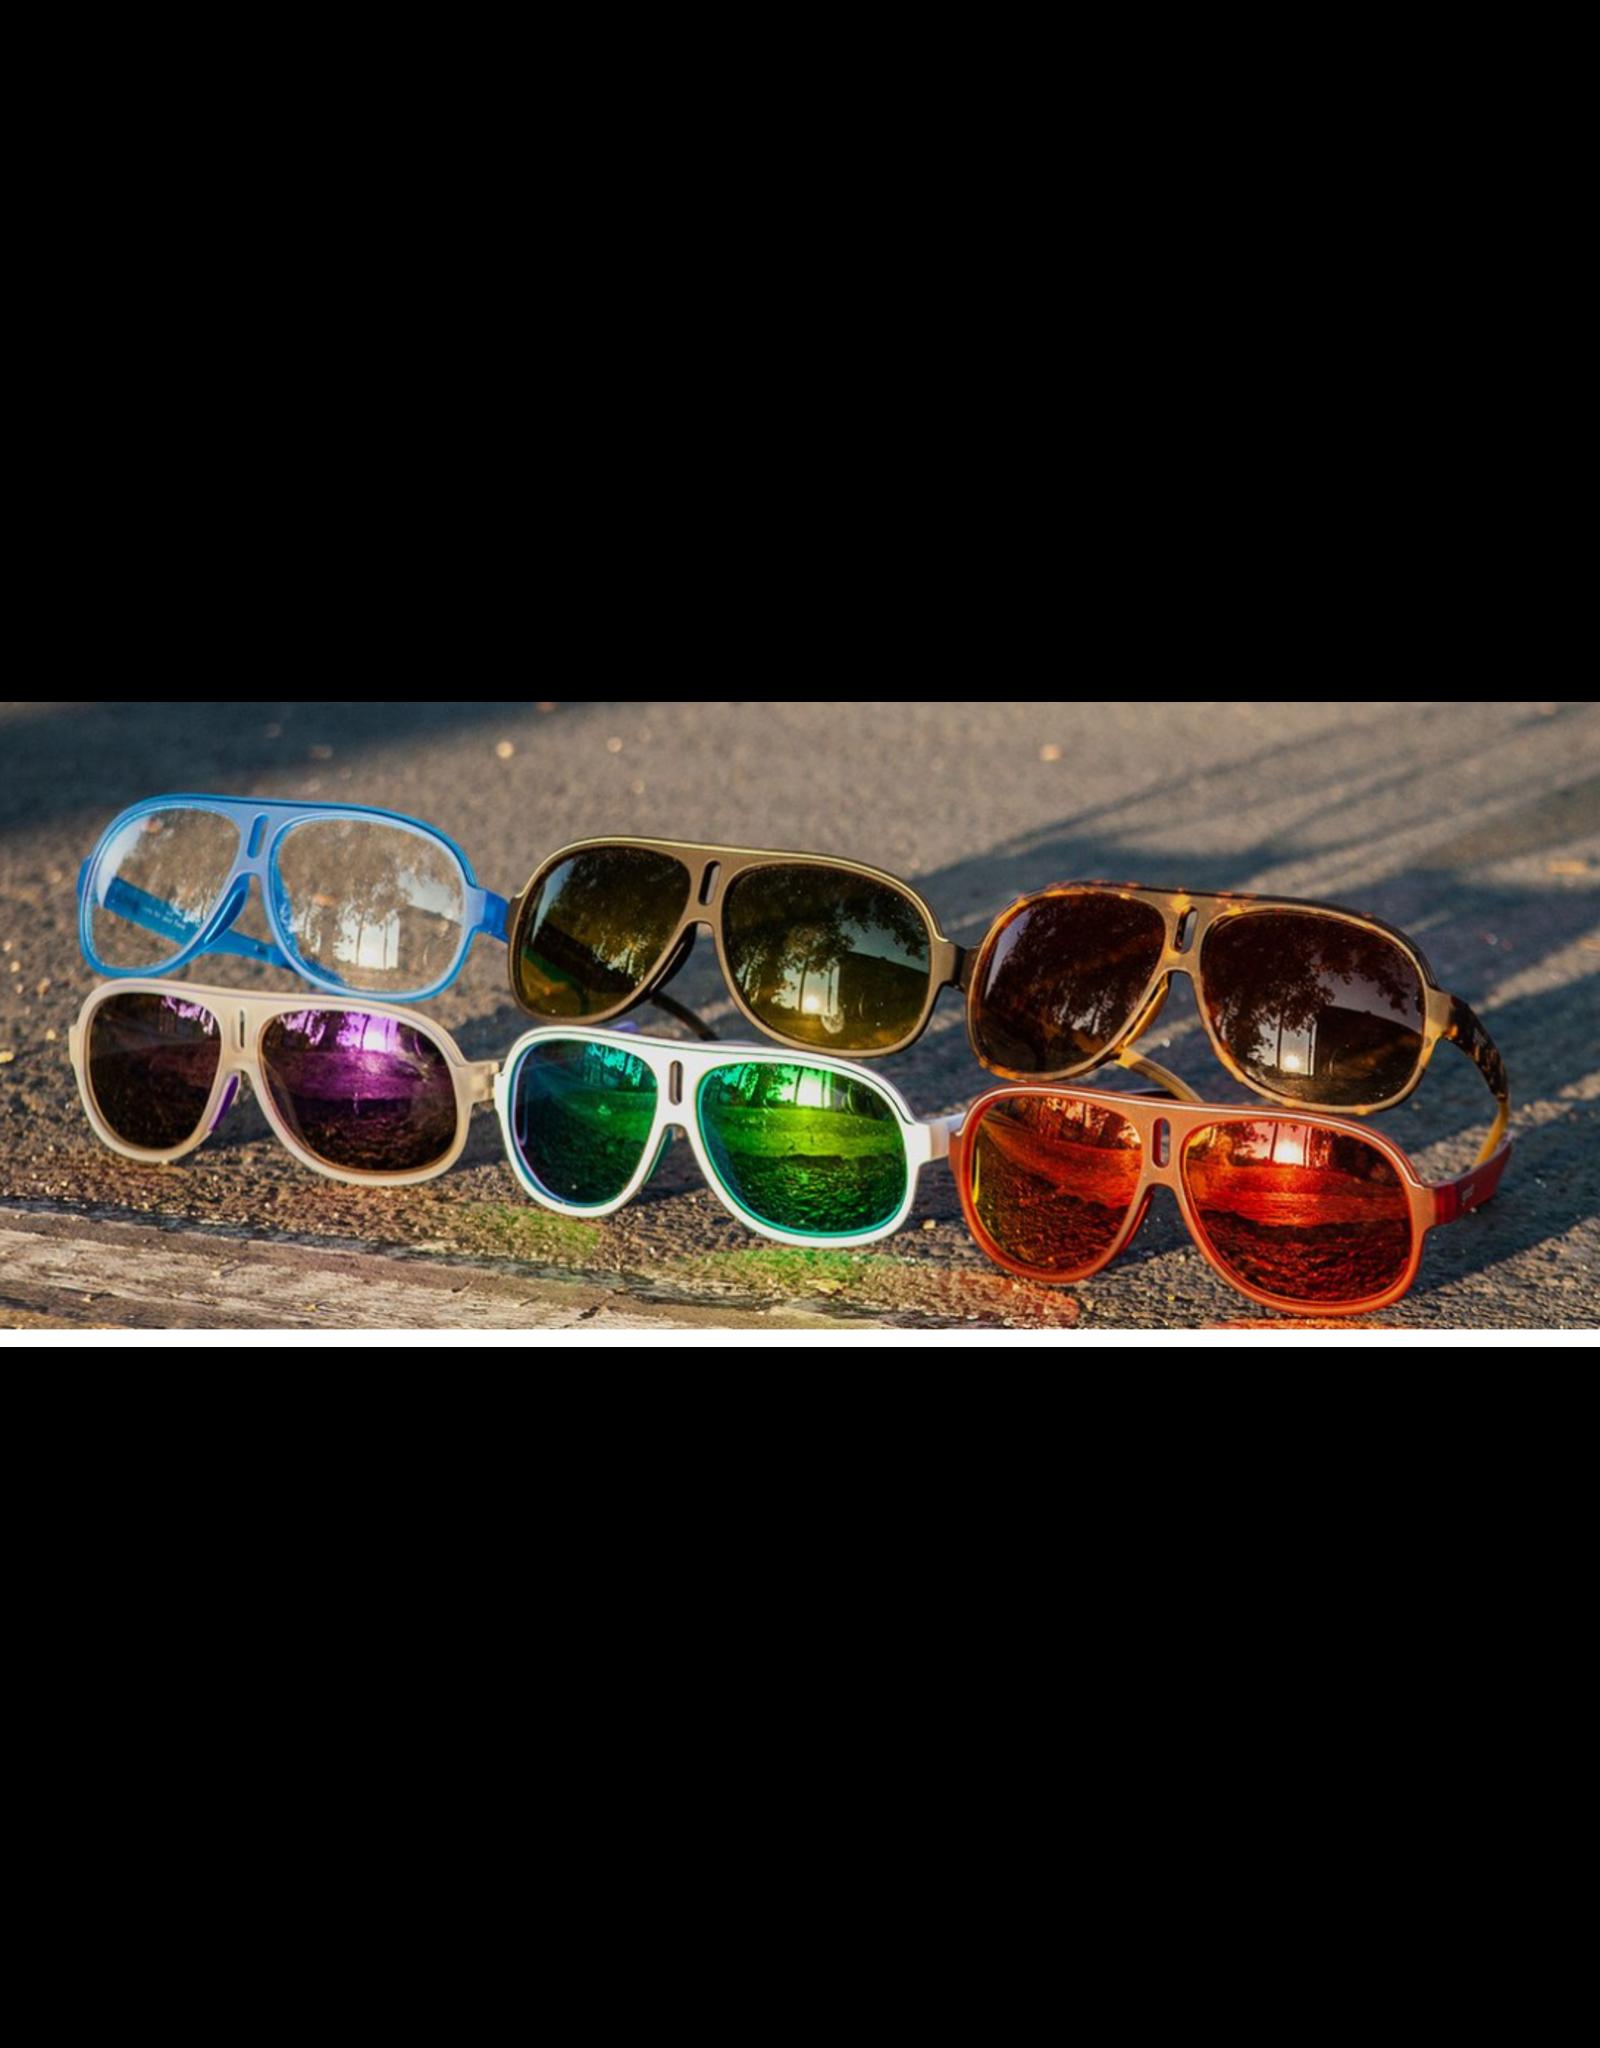 GOOD'R SUNGLASSES Goodr Super Fly Glasses